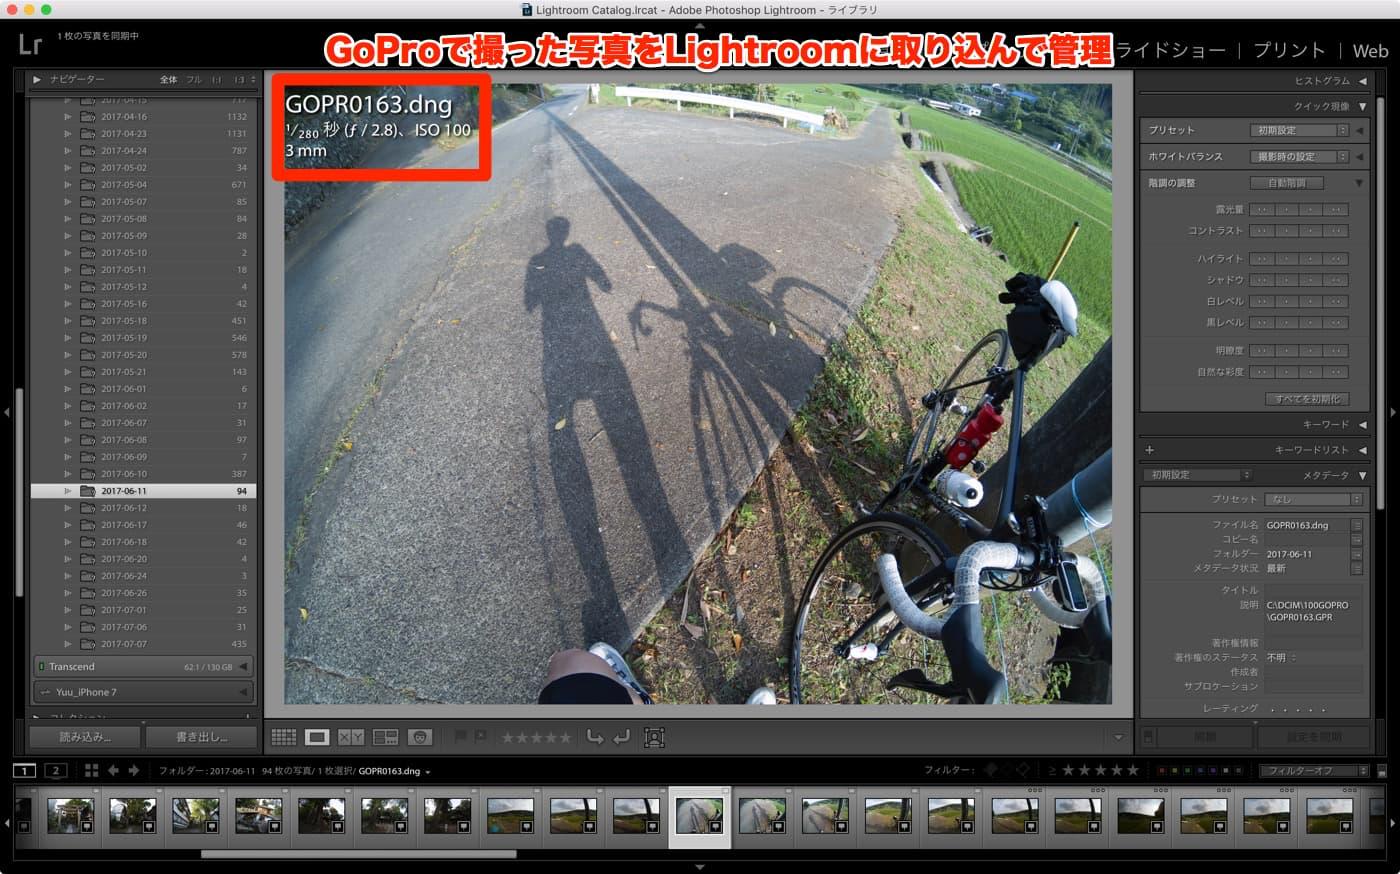 goproの写真をLightroomで管理する方法